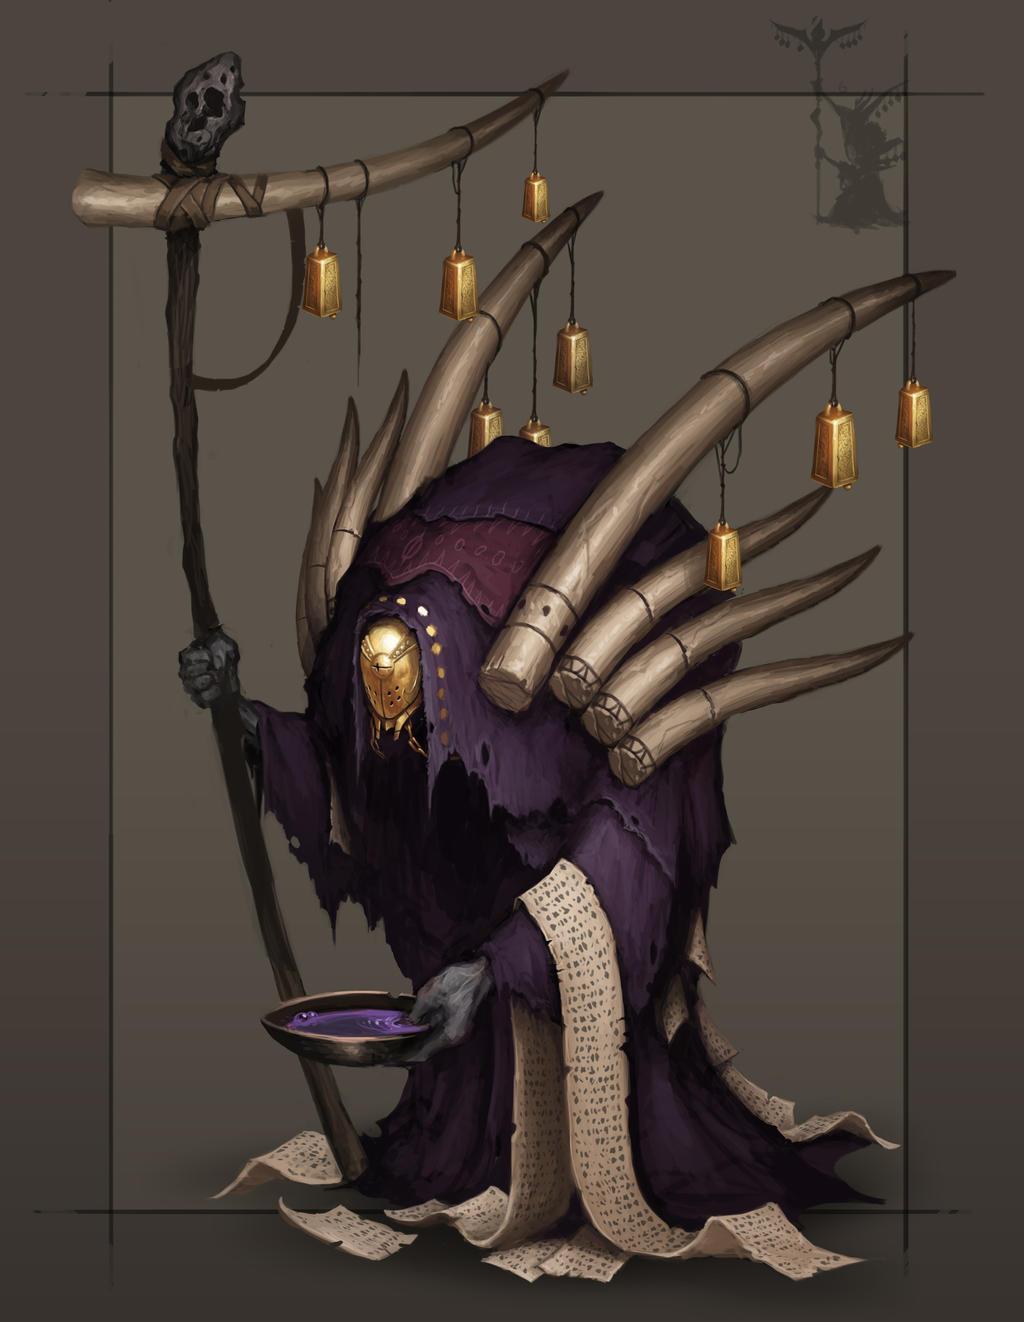 High Priest - Ancient Civilization challenge